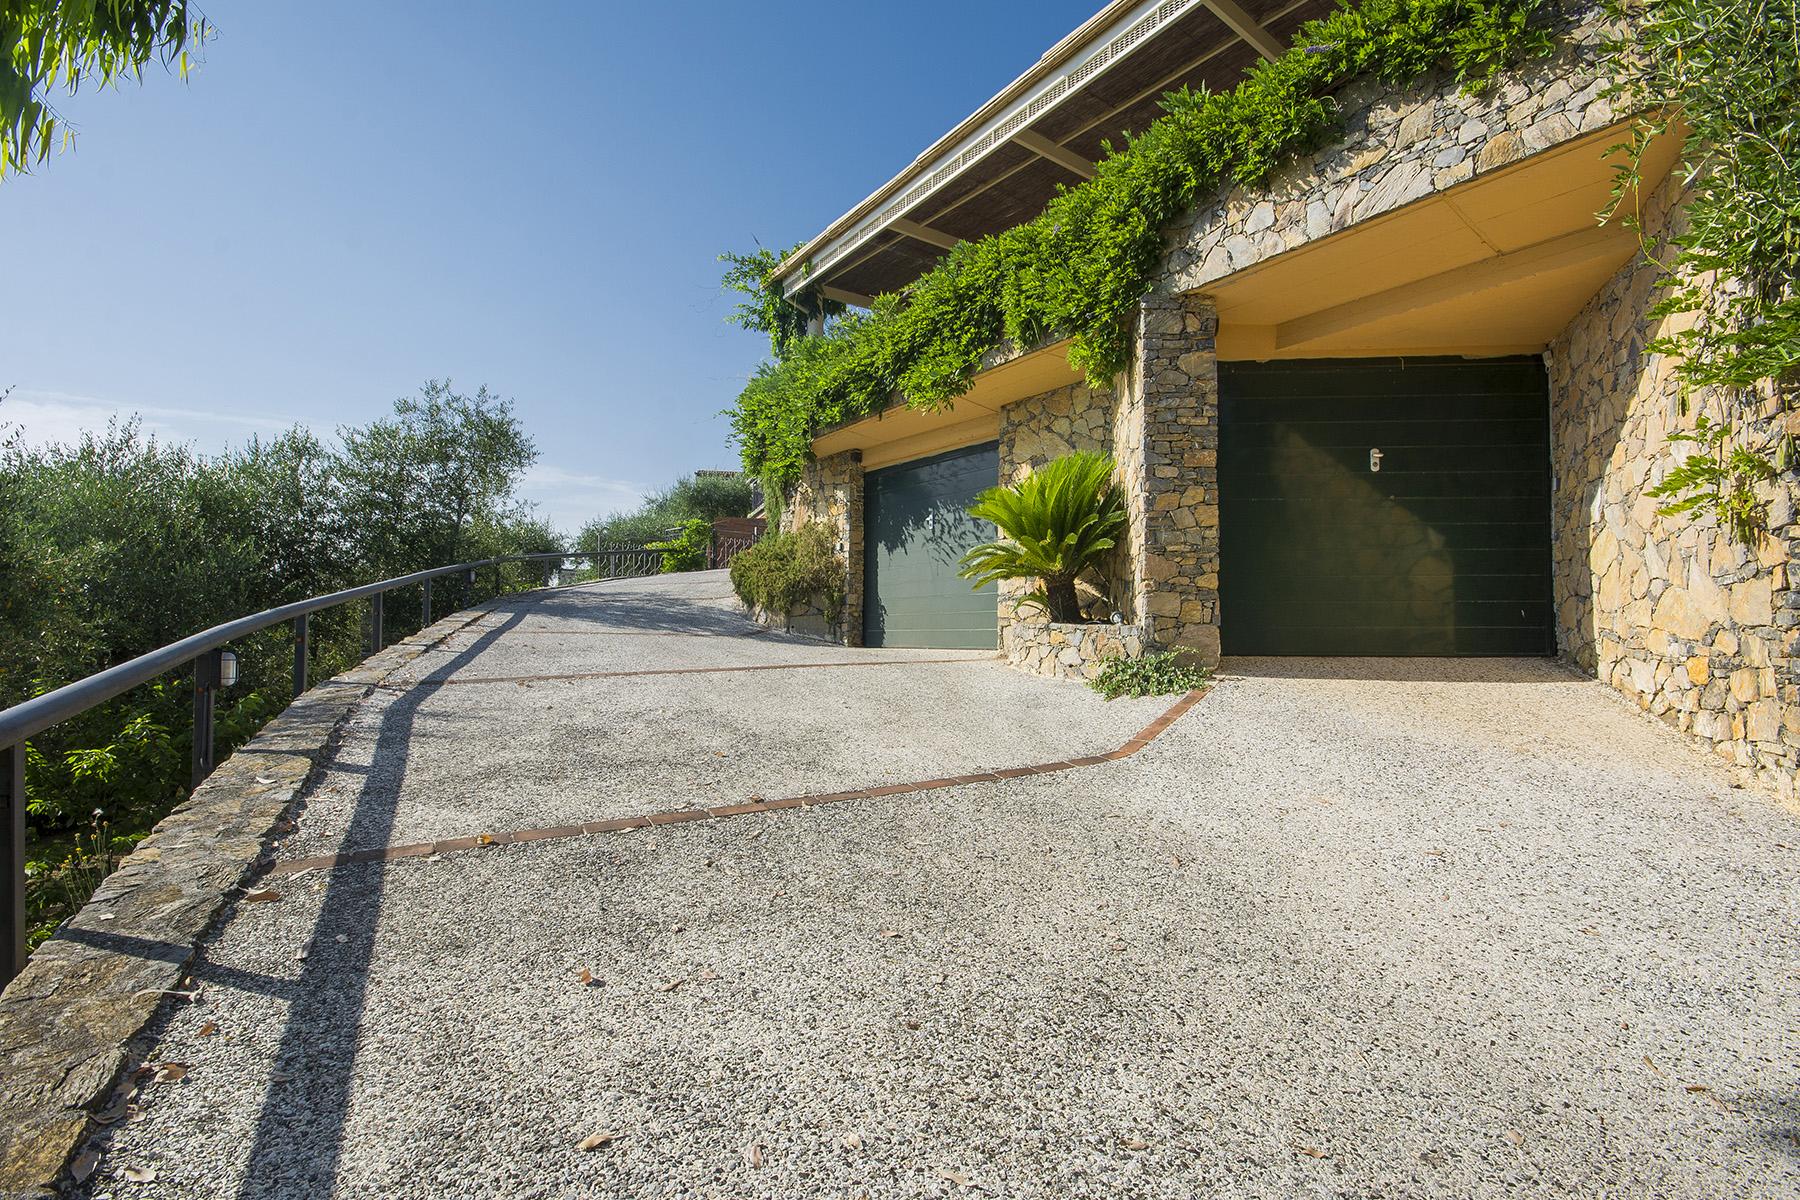 Villa in Vendita a Lerici: 5 locali, 580 mq - Foto 25